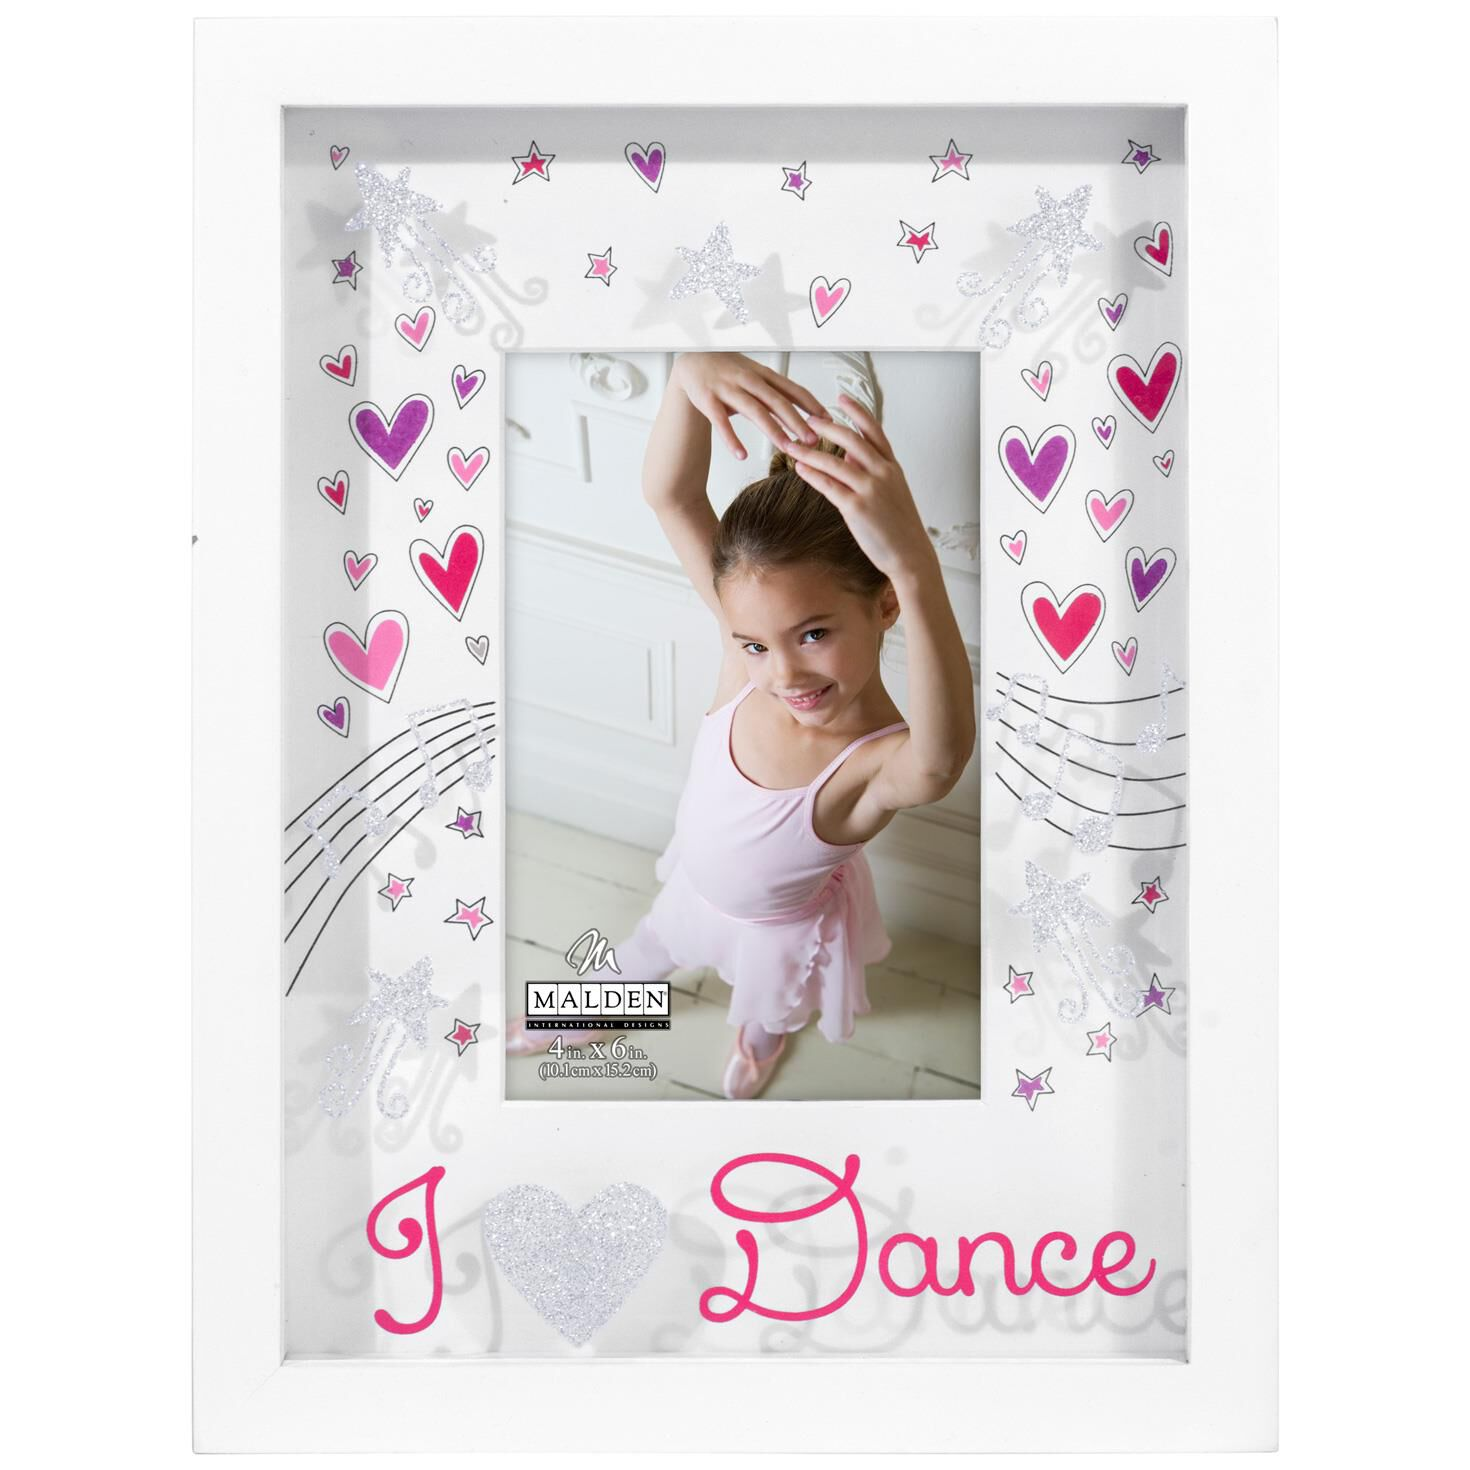 I Love Dance Picture Frame, 4x6 - Picture Frames - Hallmark